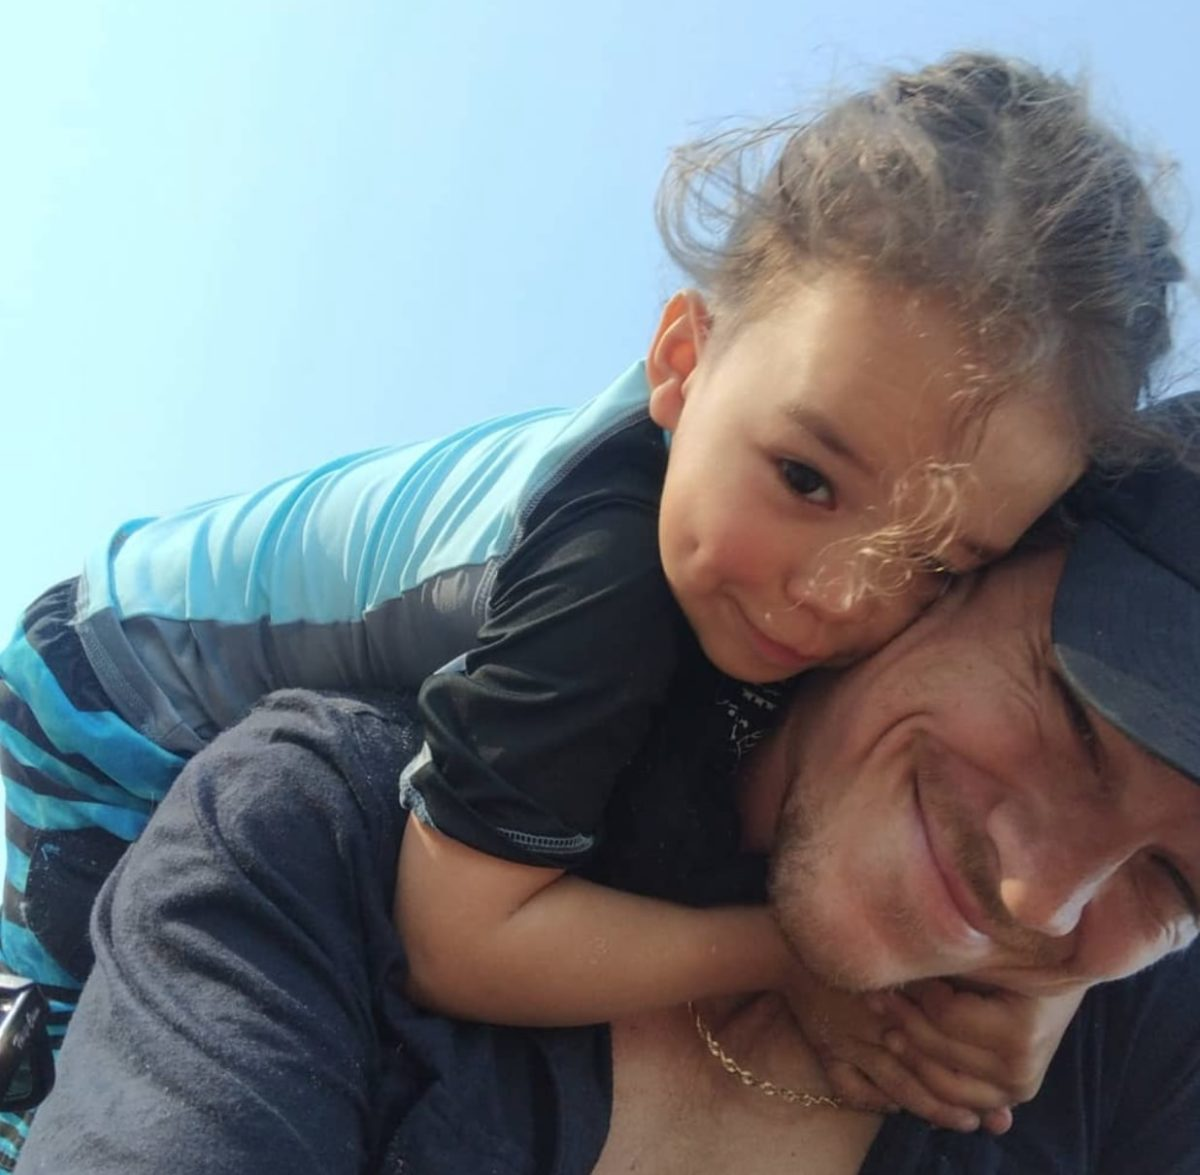 naya rivera's ex ryan dorsey says son has been so 'brave'